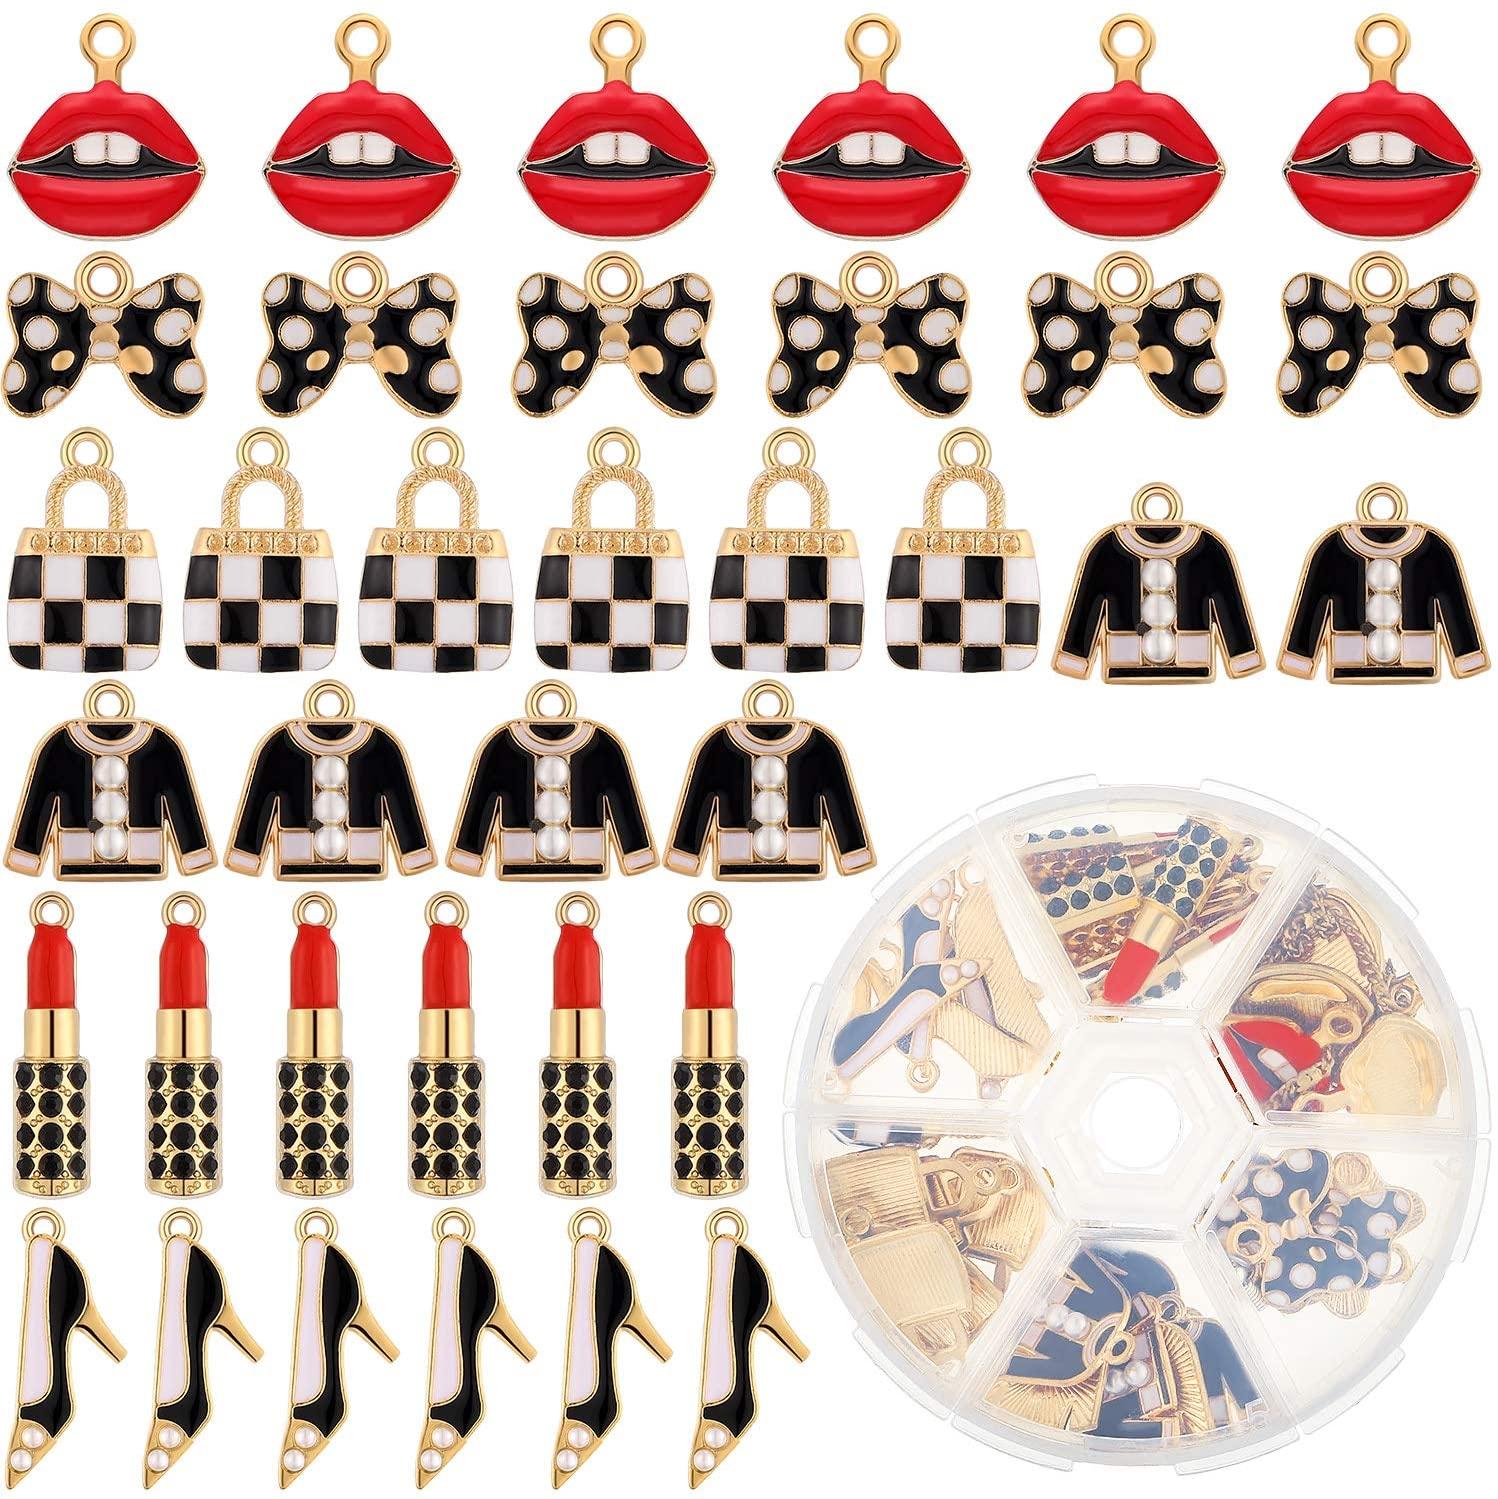 36 Pieces Mixed Makeup Charms Lip Lipstick Enamel Charms Women Purses Shoes Pendants DIY Enamel Pendants with Storage Box for Jewelry Making